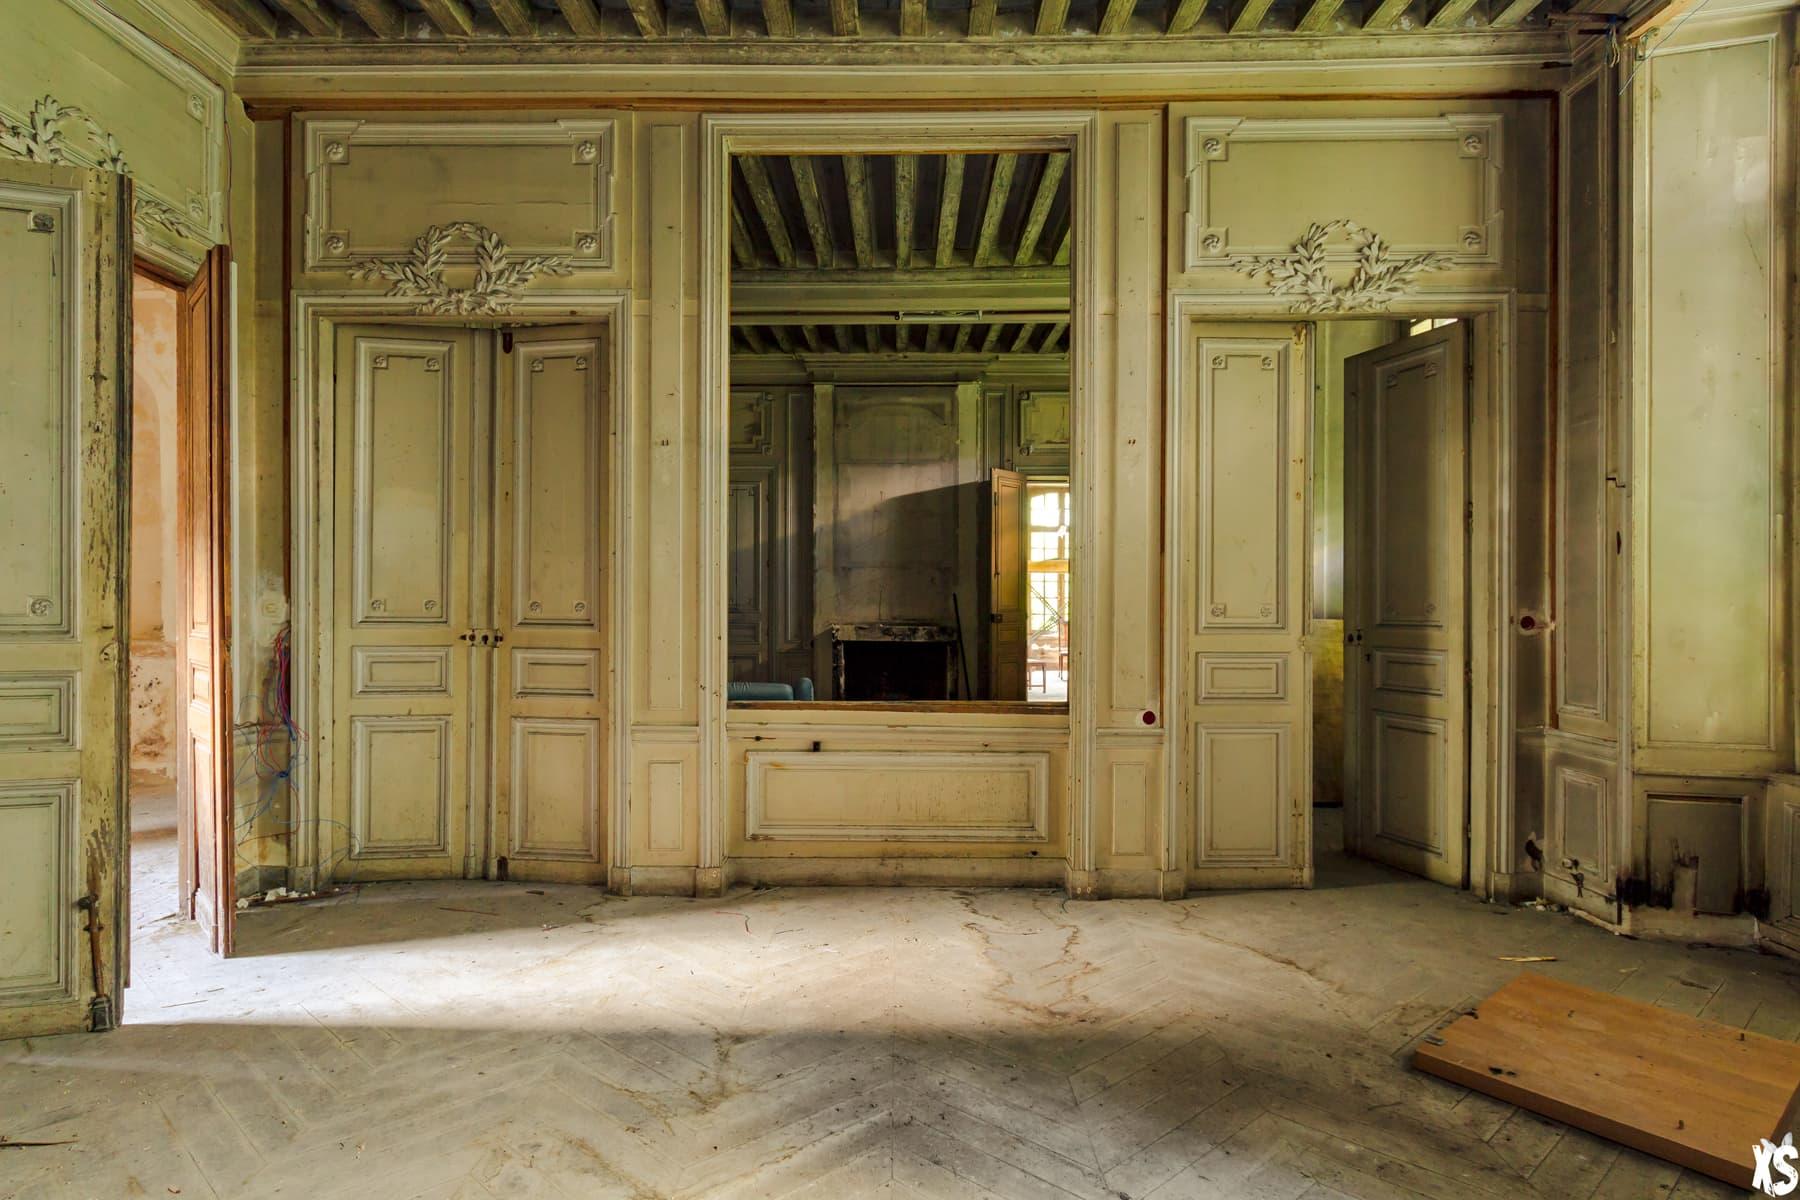 Château abandonné en France | urbexsession.com/chateau-larry-eyler | Urbex France